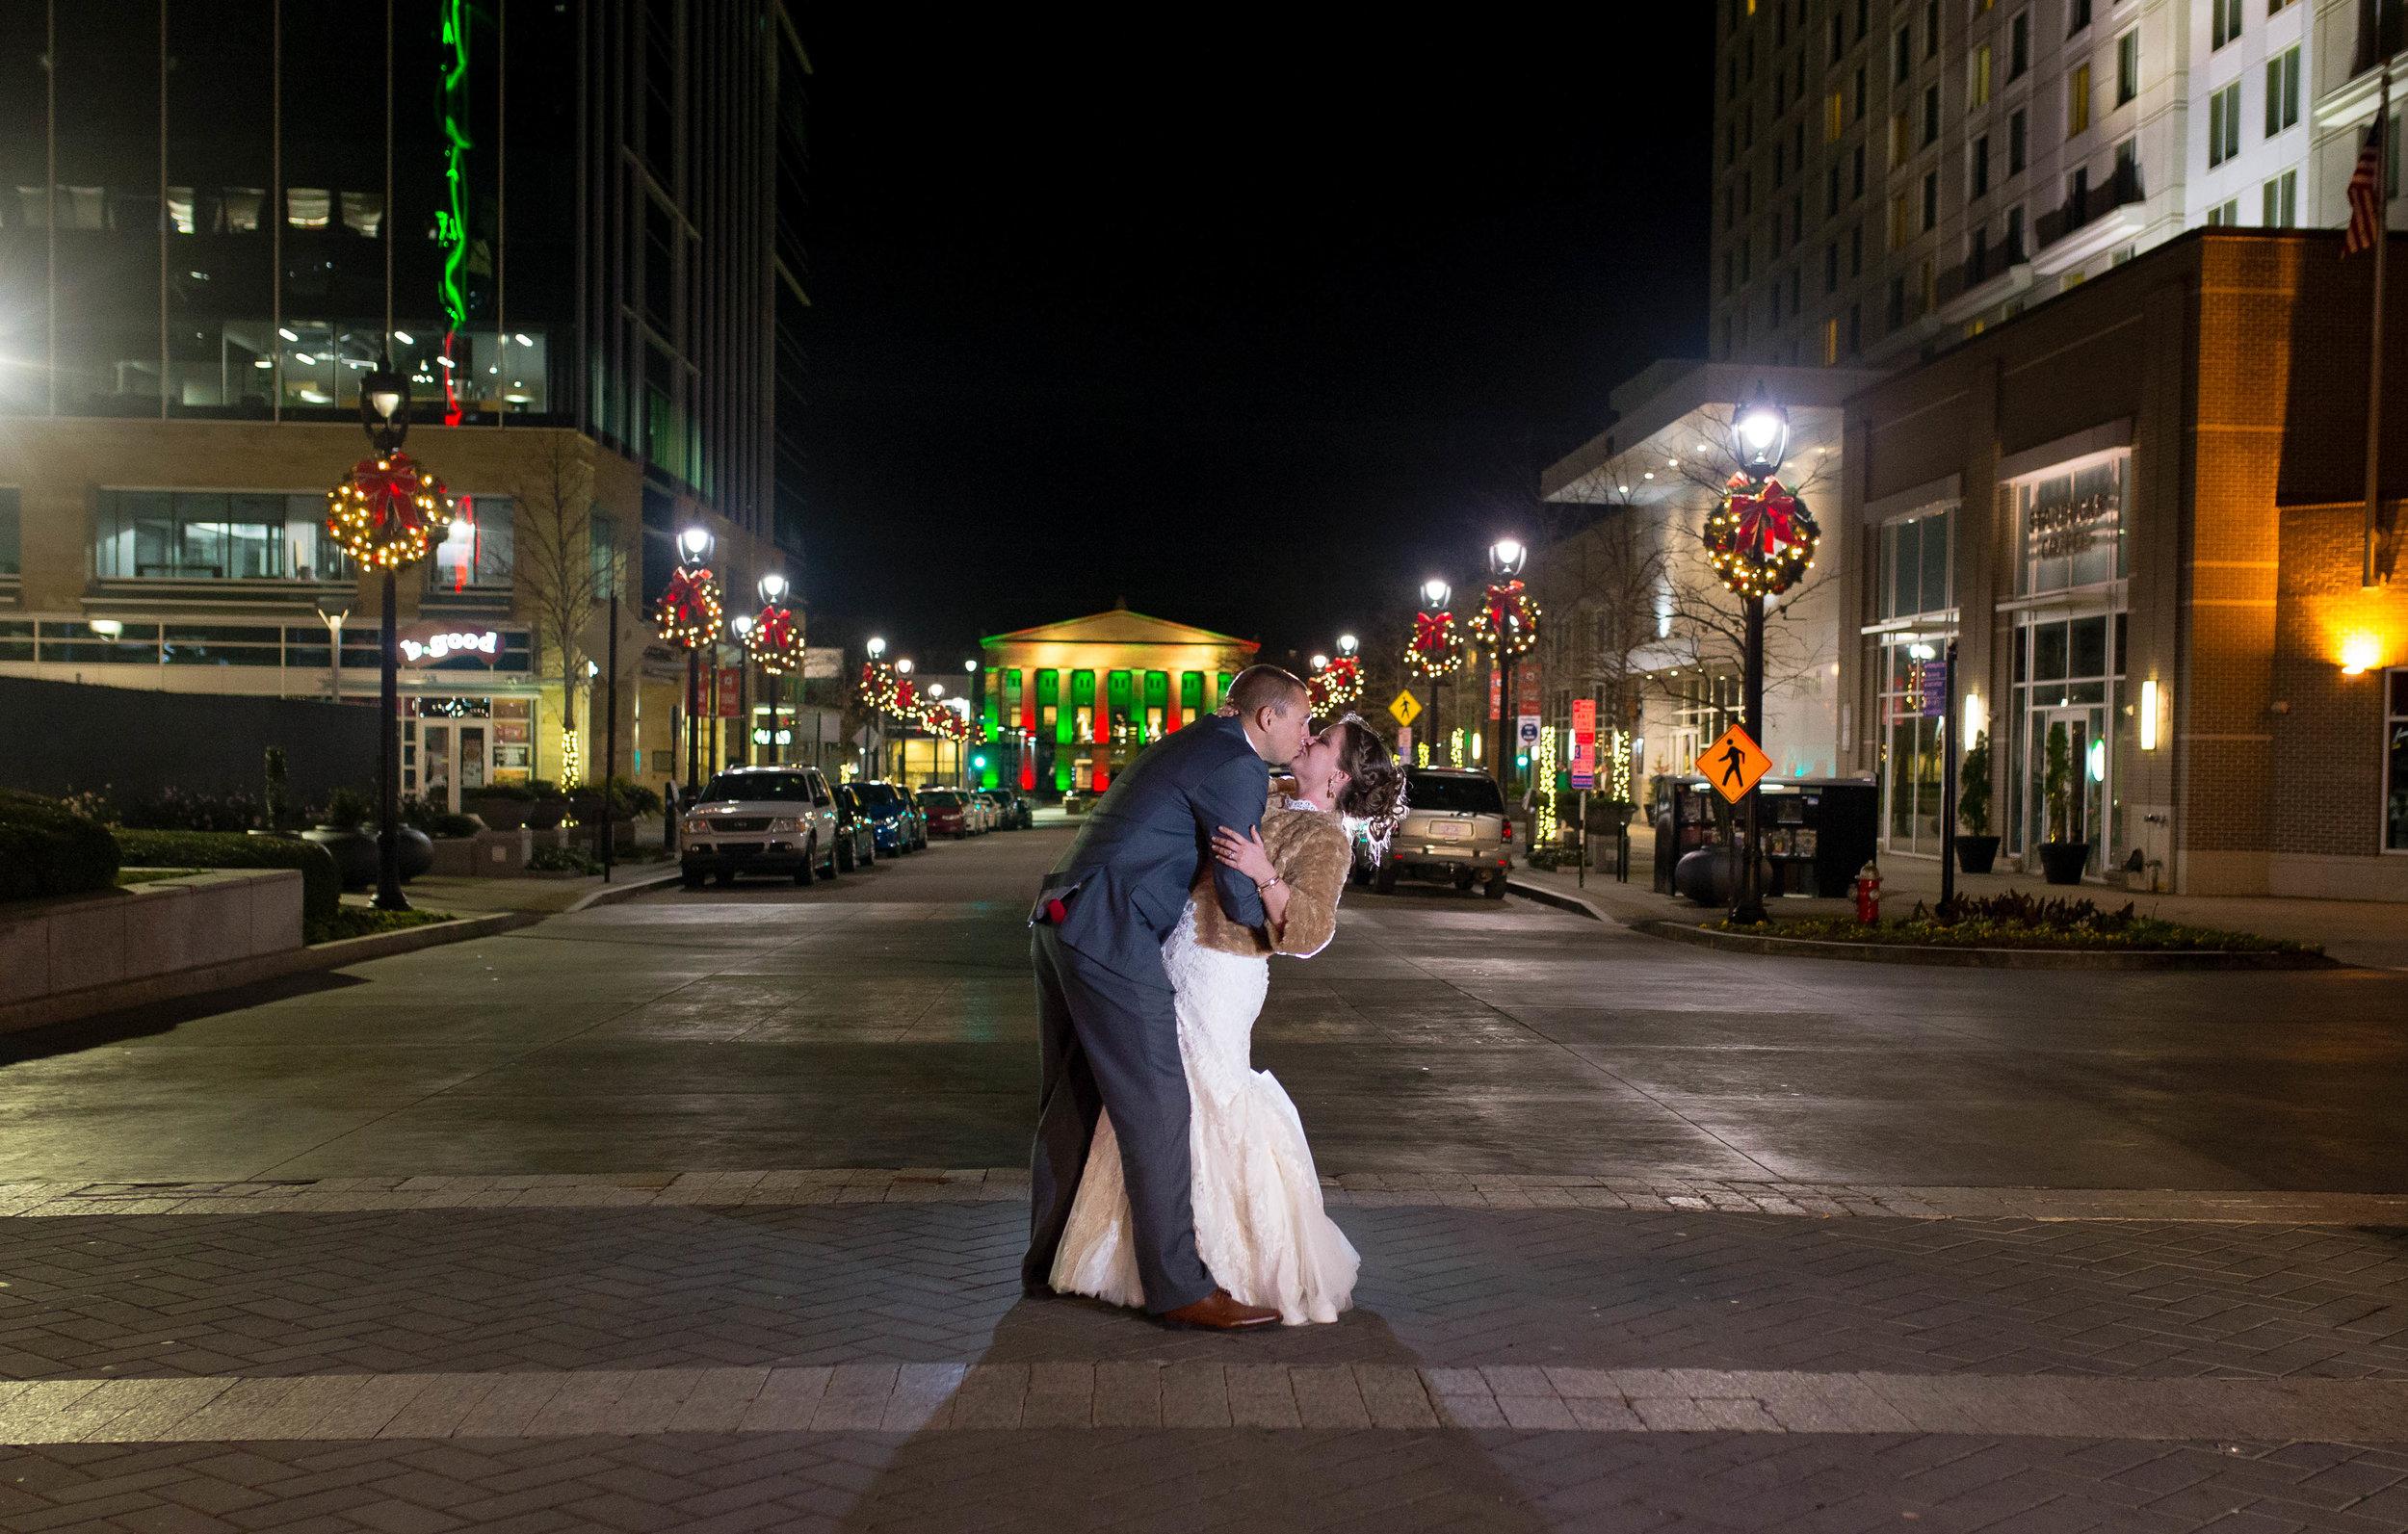 Raleigh Night wedding photography on fayetteville street